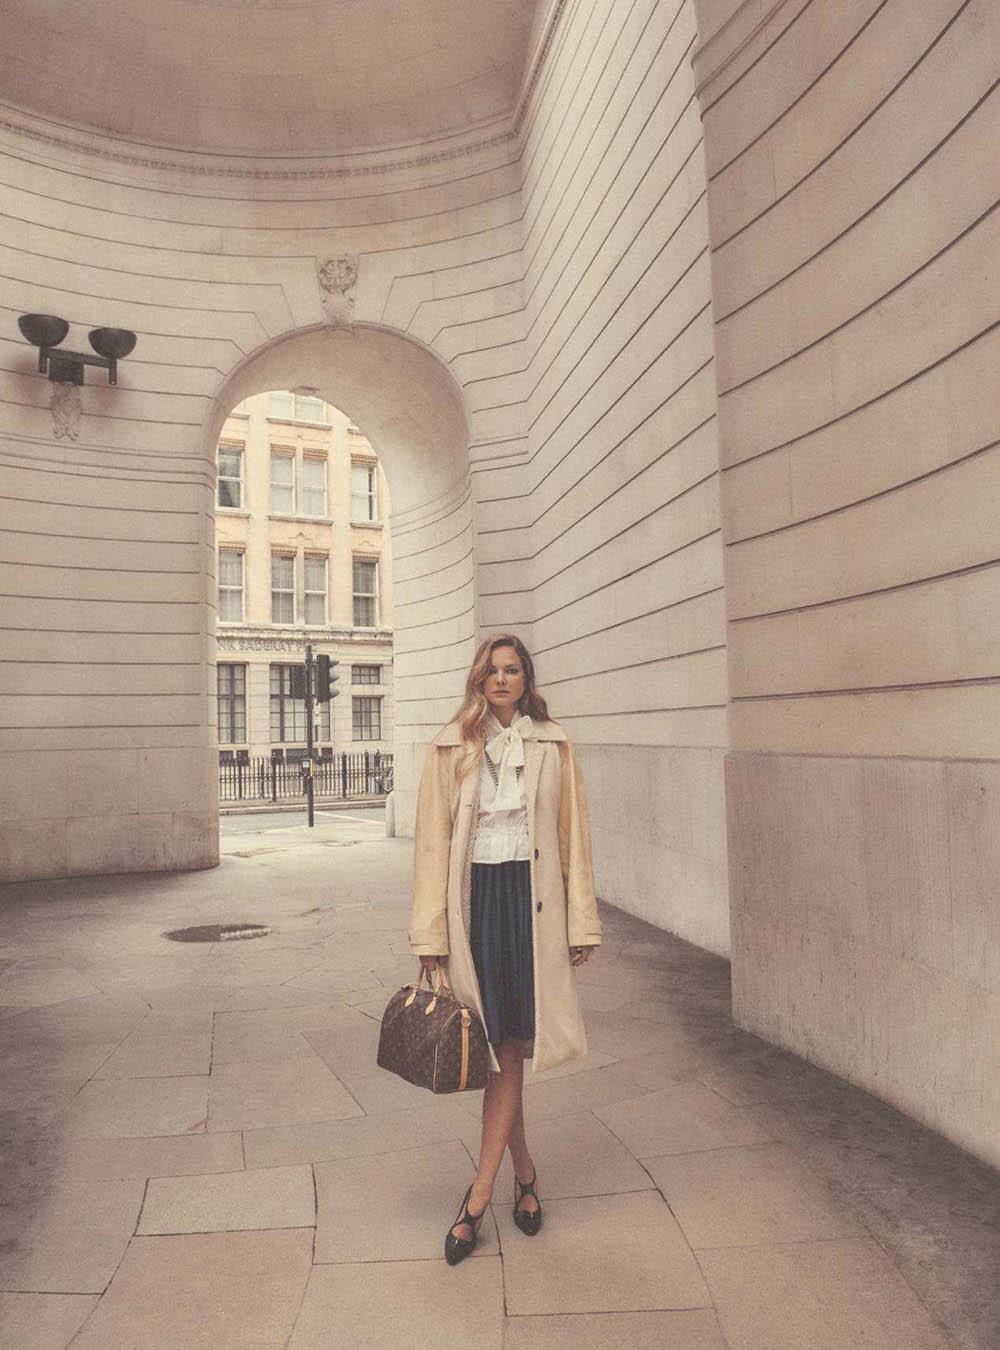 Eniko Mihalik by Regan Cameron for Harper's Bazaar UK September 2018